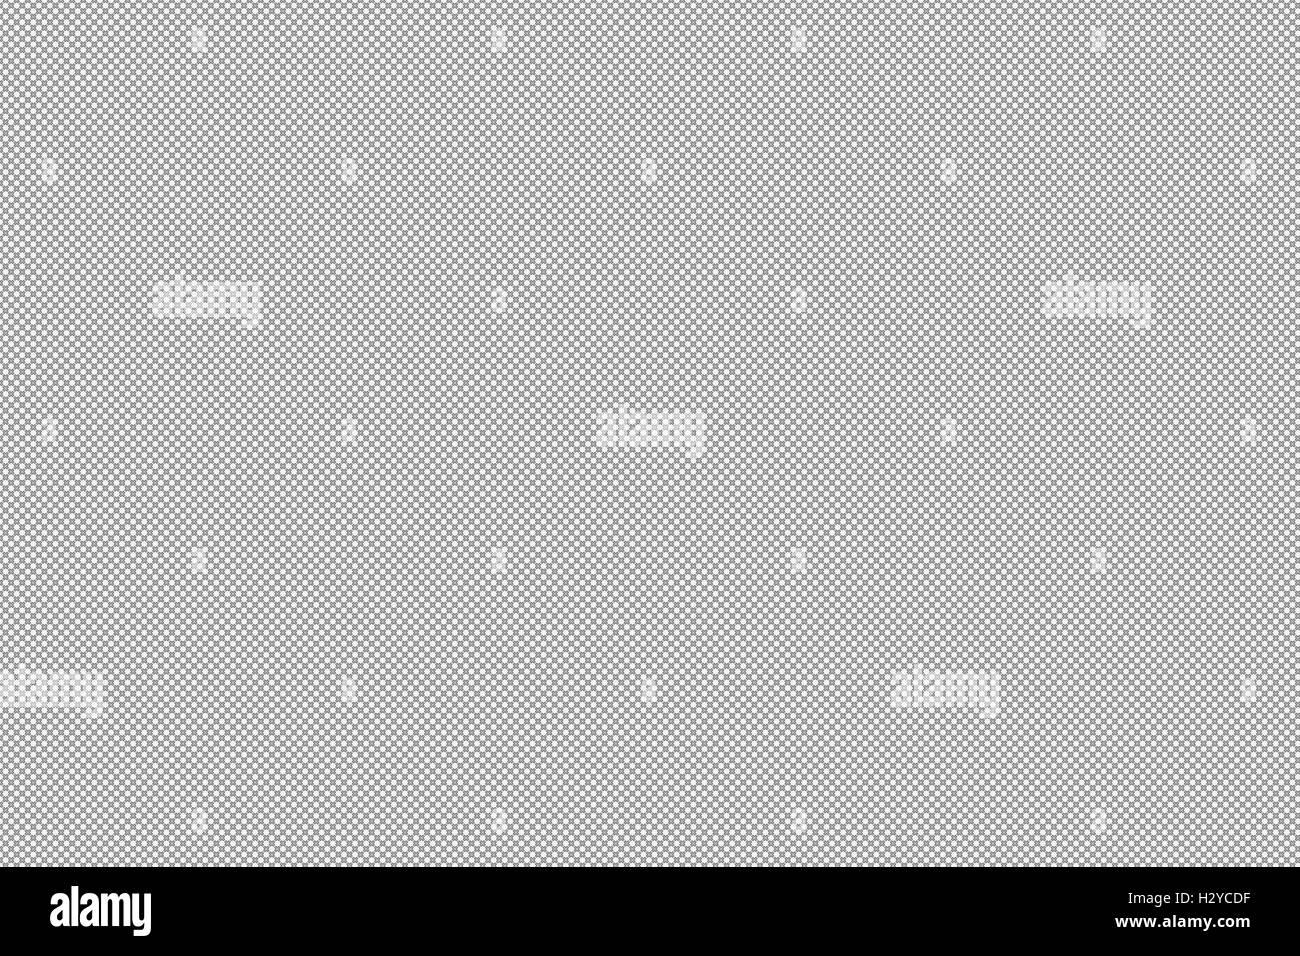 gray wallpaper pattern background - Stock Image